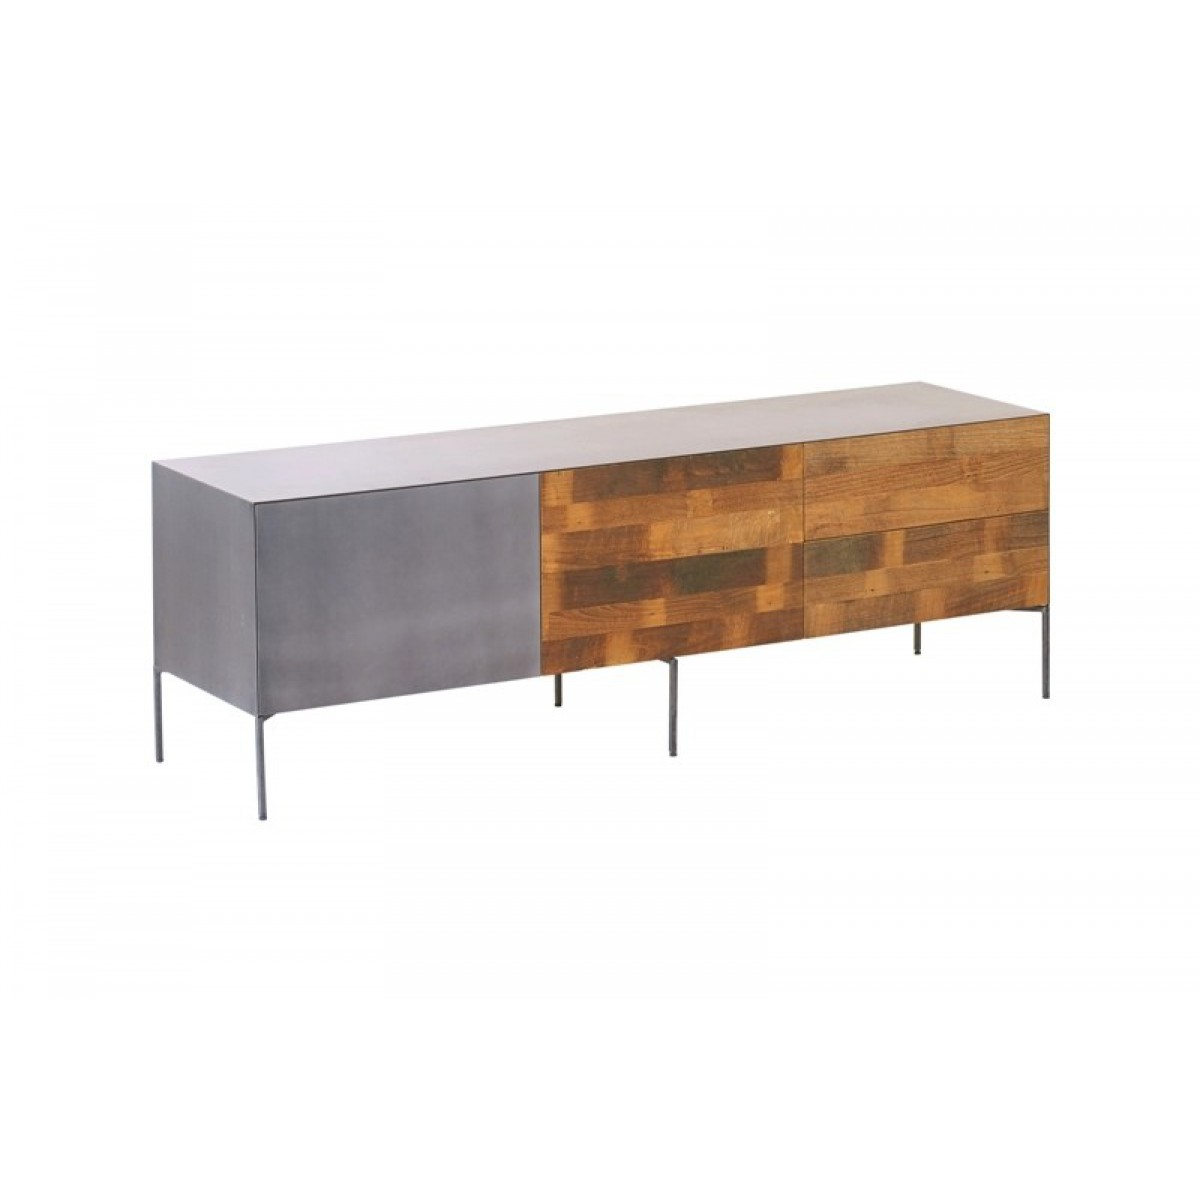 pandora-tv-dressoir-deur-klep-lade-166cm